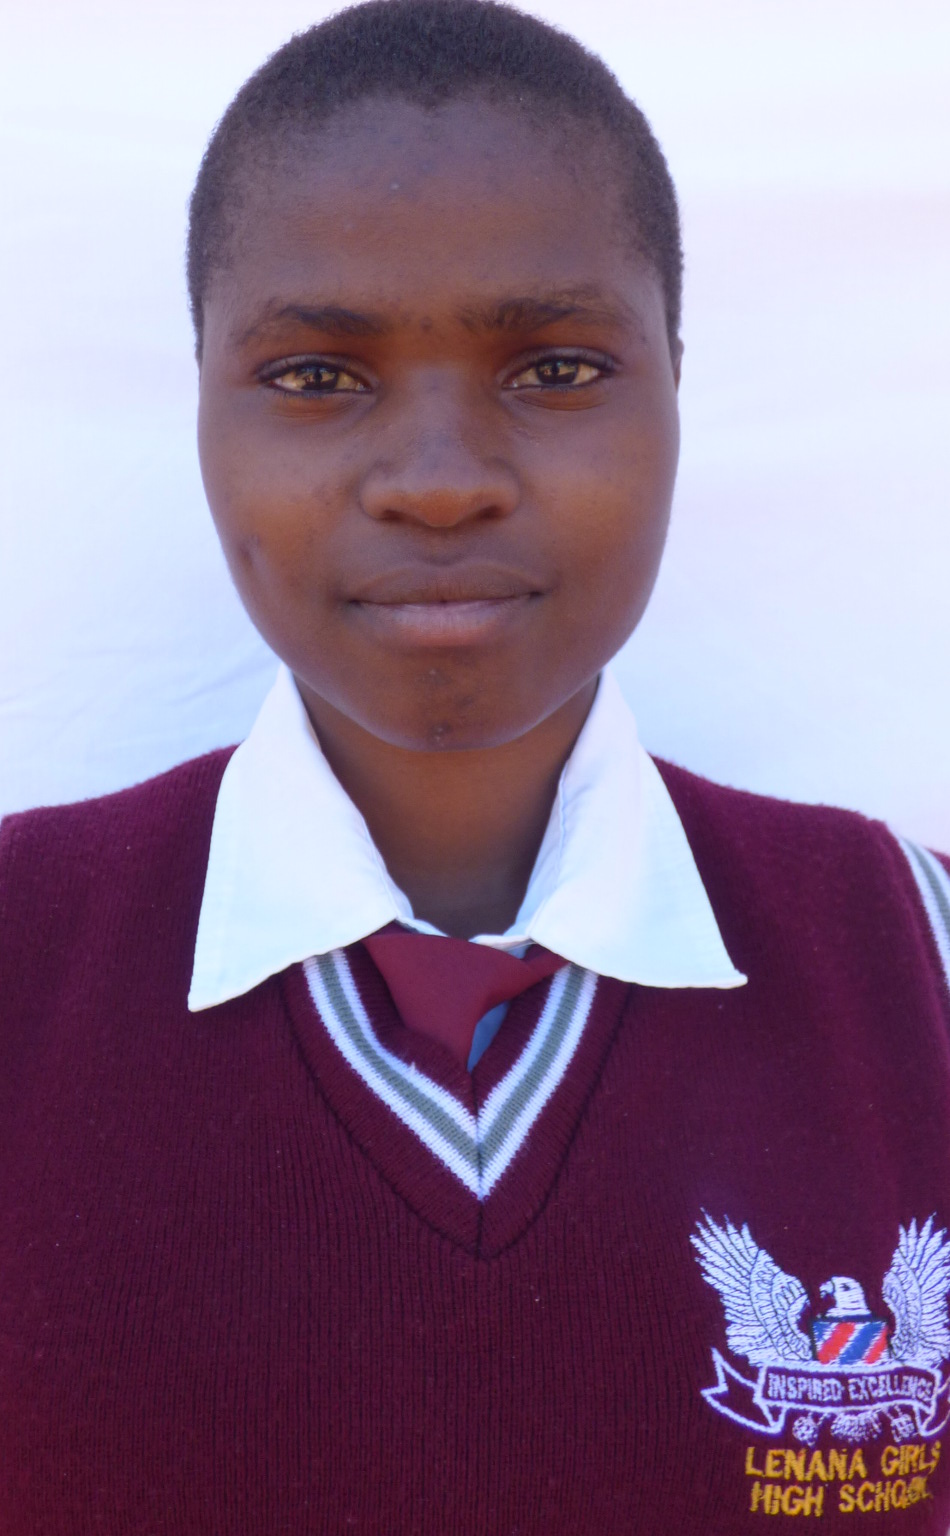 Sarah from Lenana Girls' High School in Kitale, Kenya